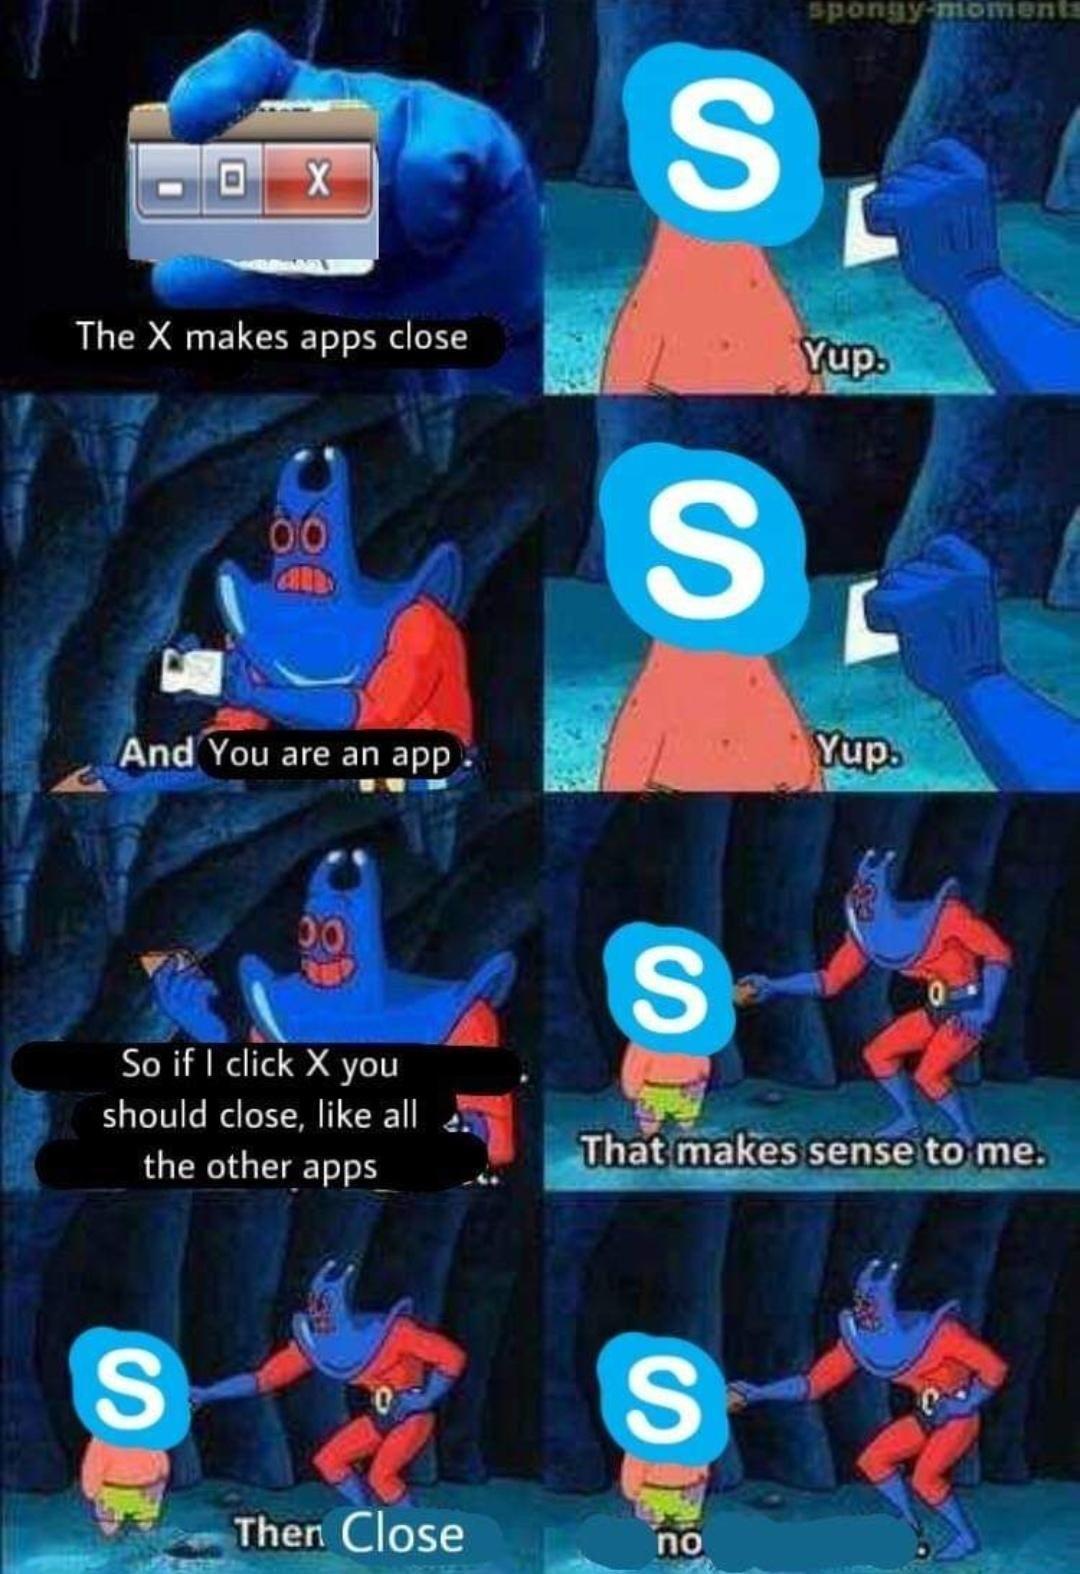 Skype memes are still trendy right